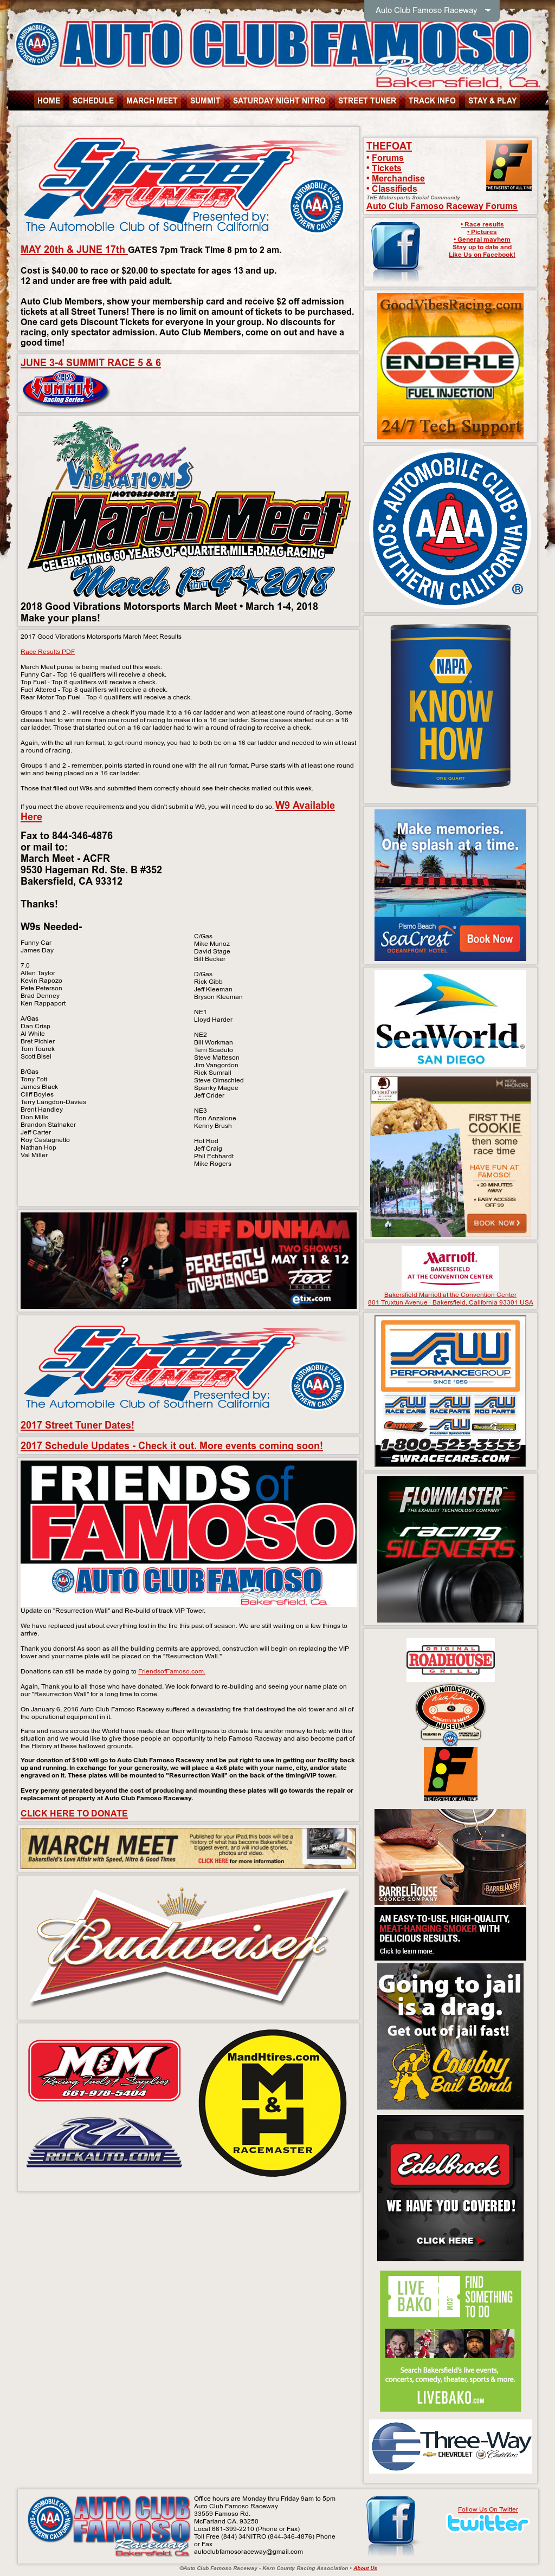 Auto Club Famoso Raceway Competitors, Revenue and Employees